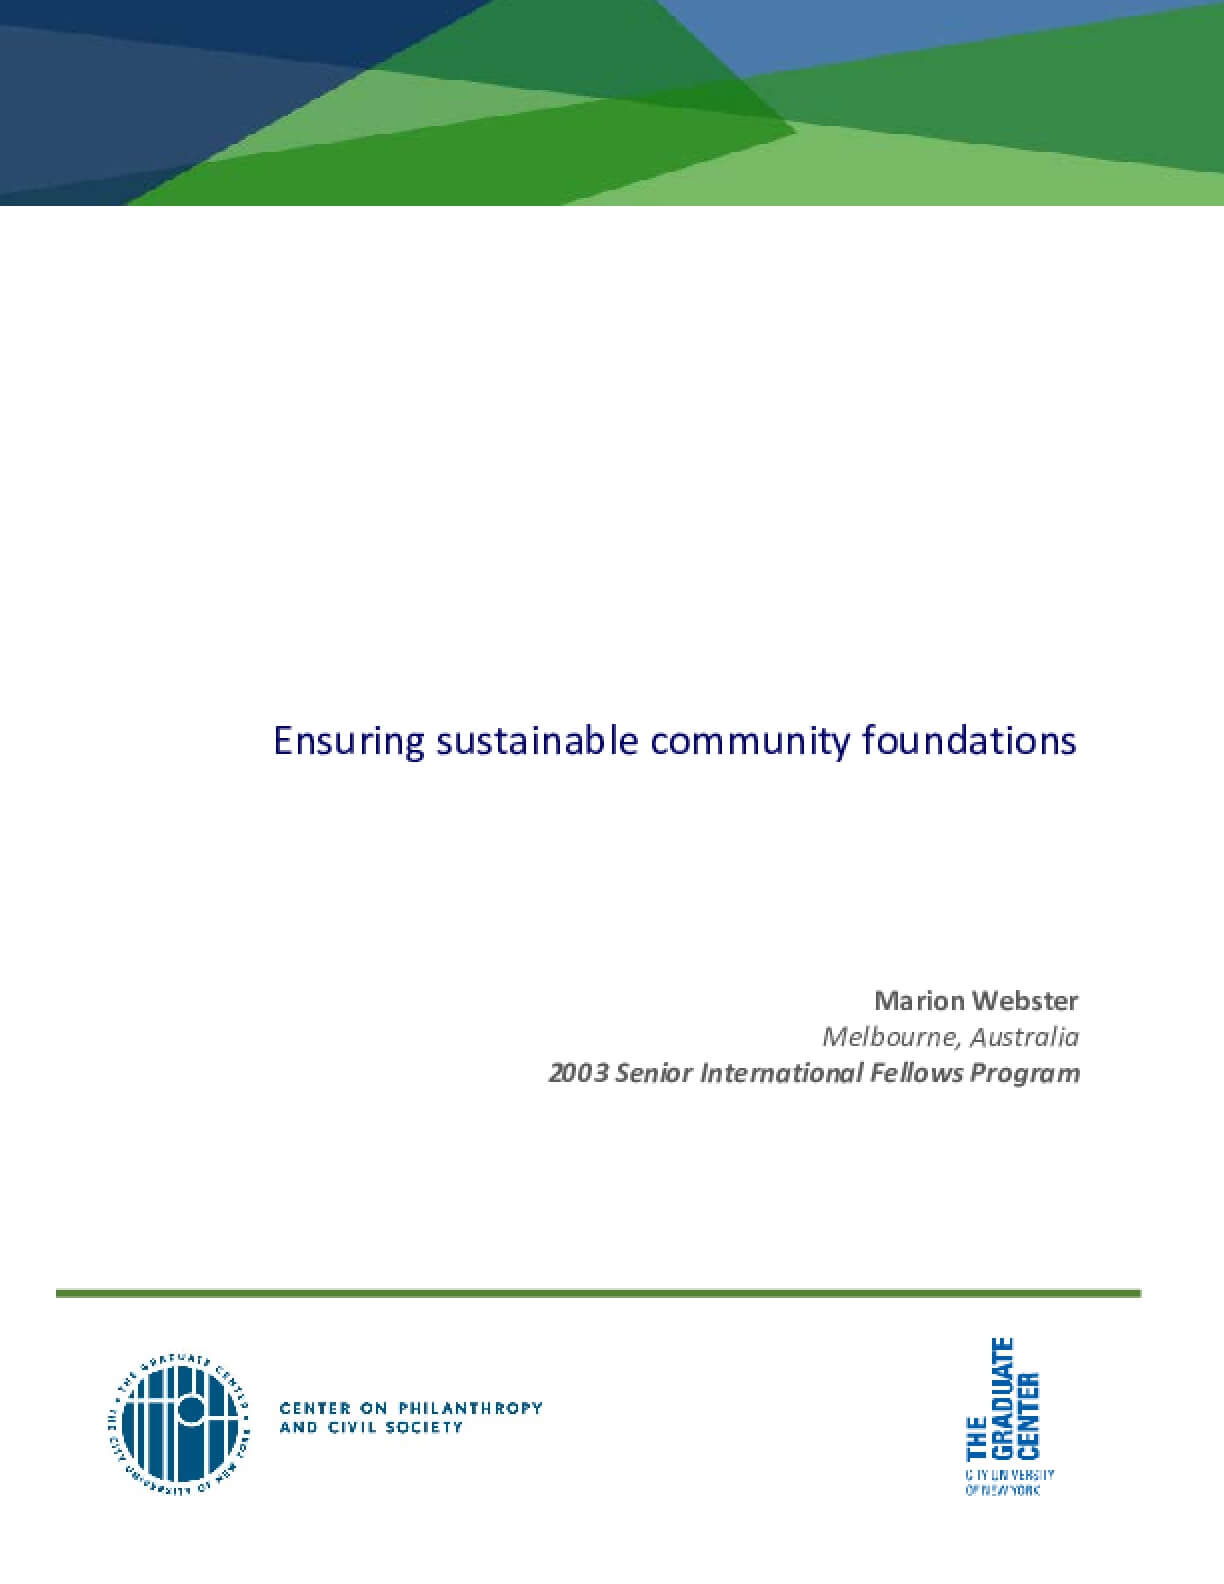 Ensuring Sustainable Community Foundations